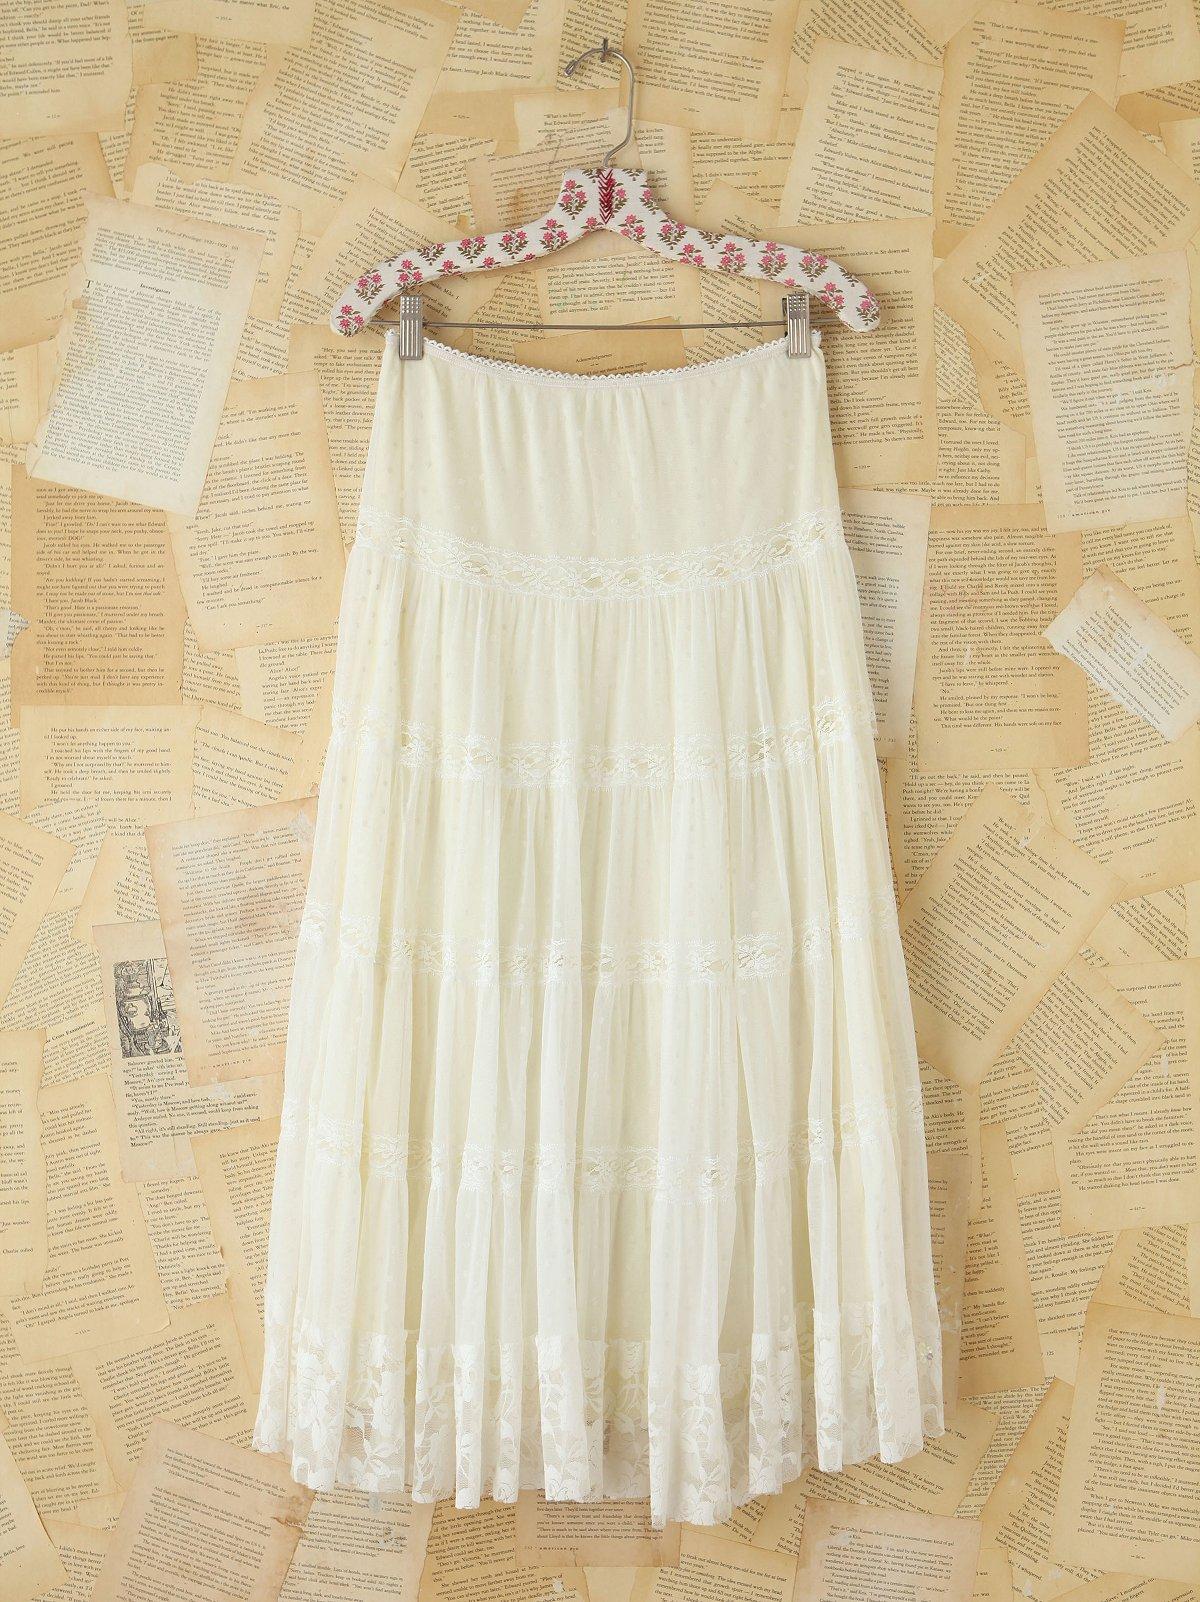 Vintage Sheer Dotted Mesh Skirt